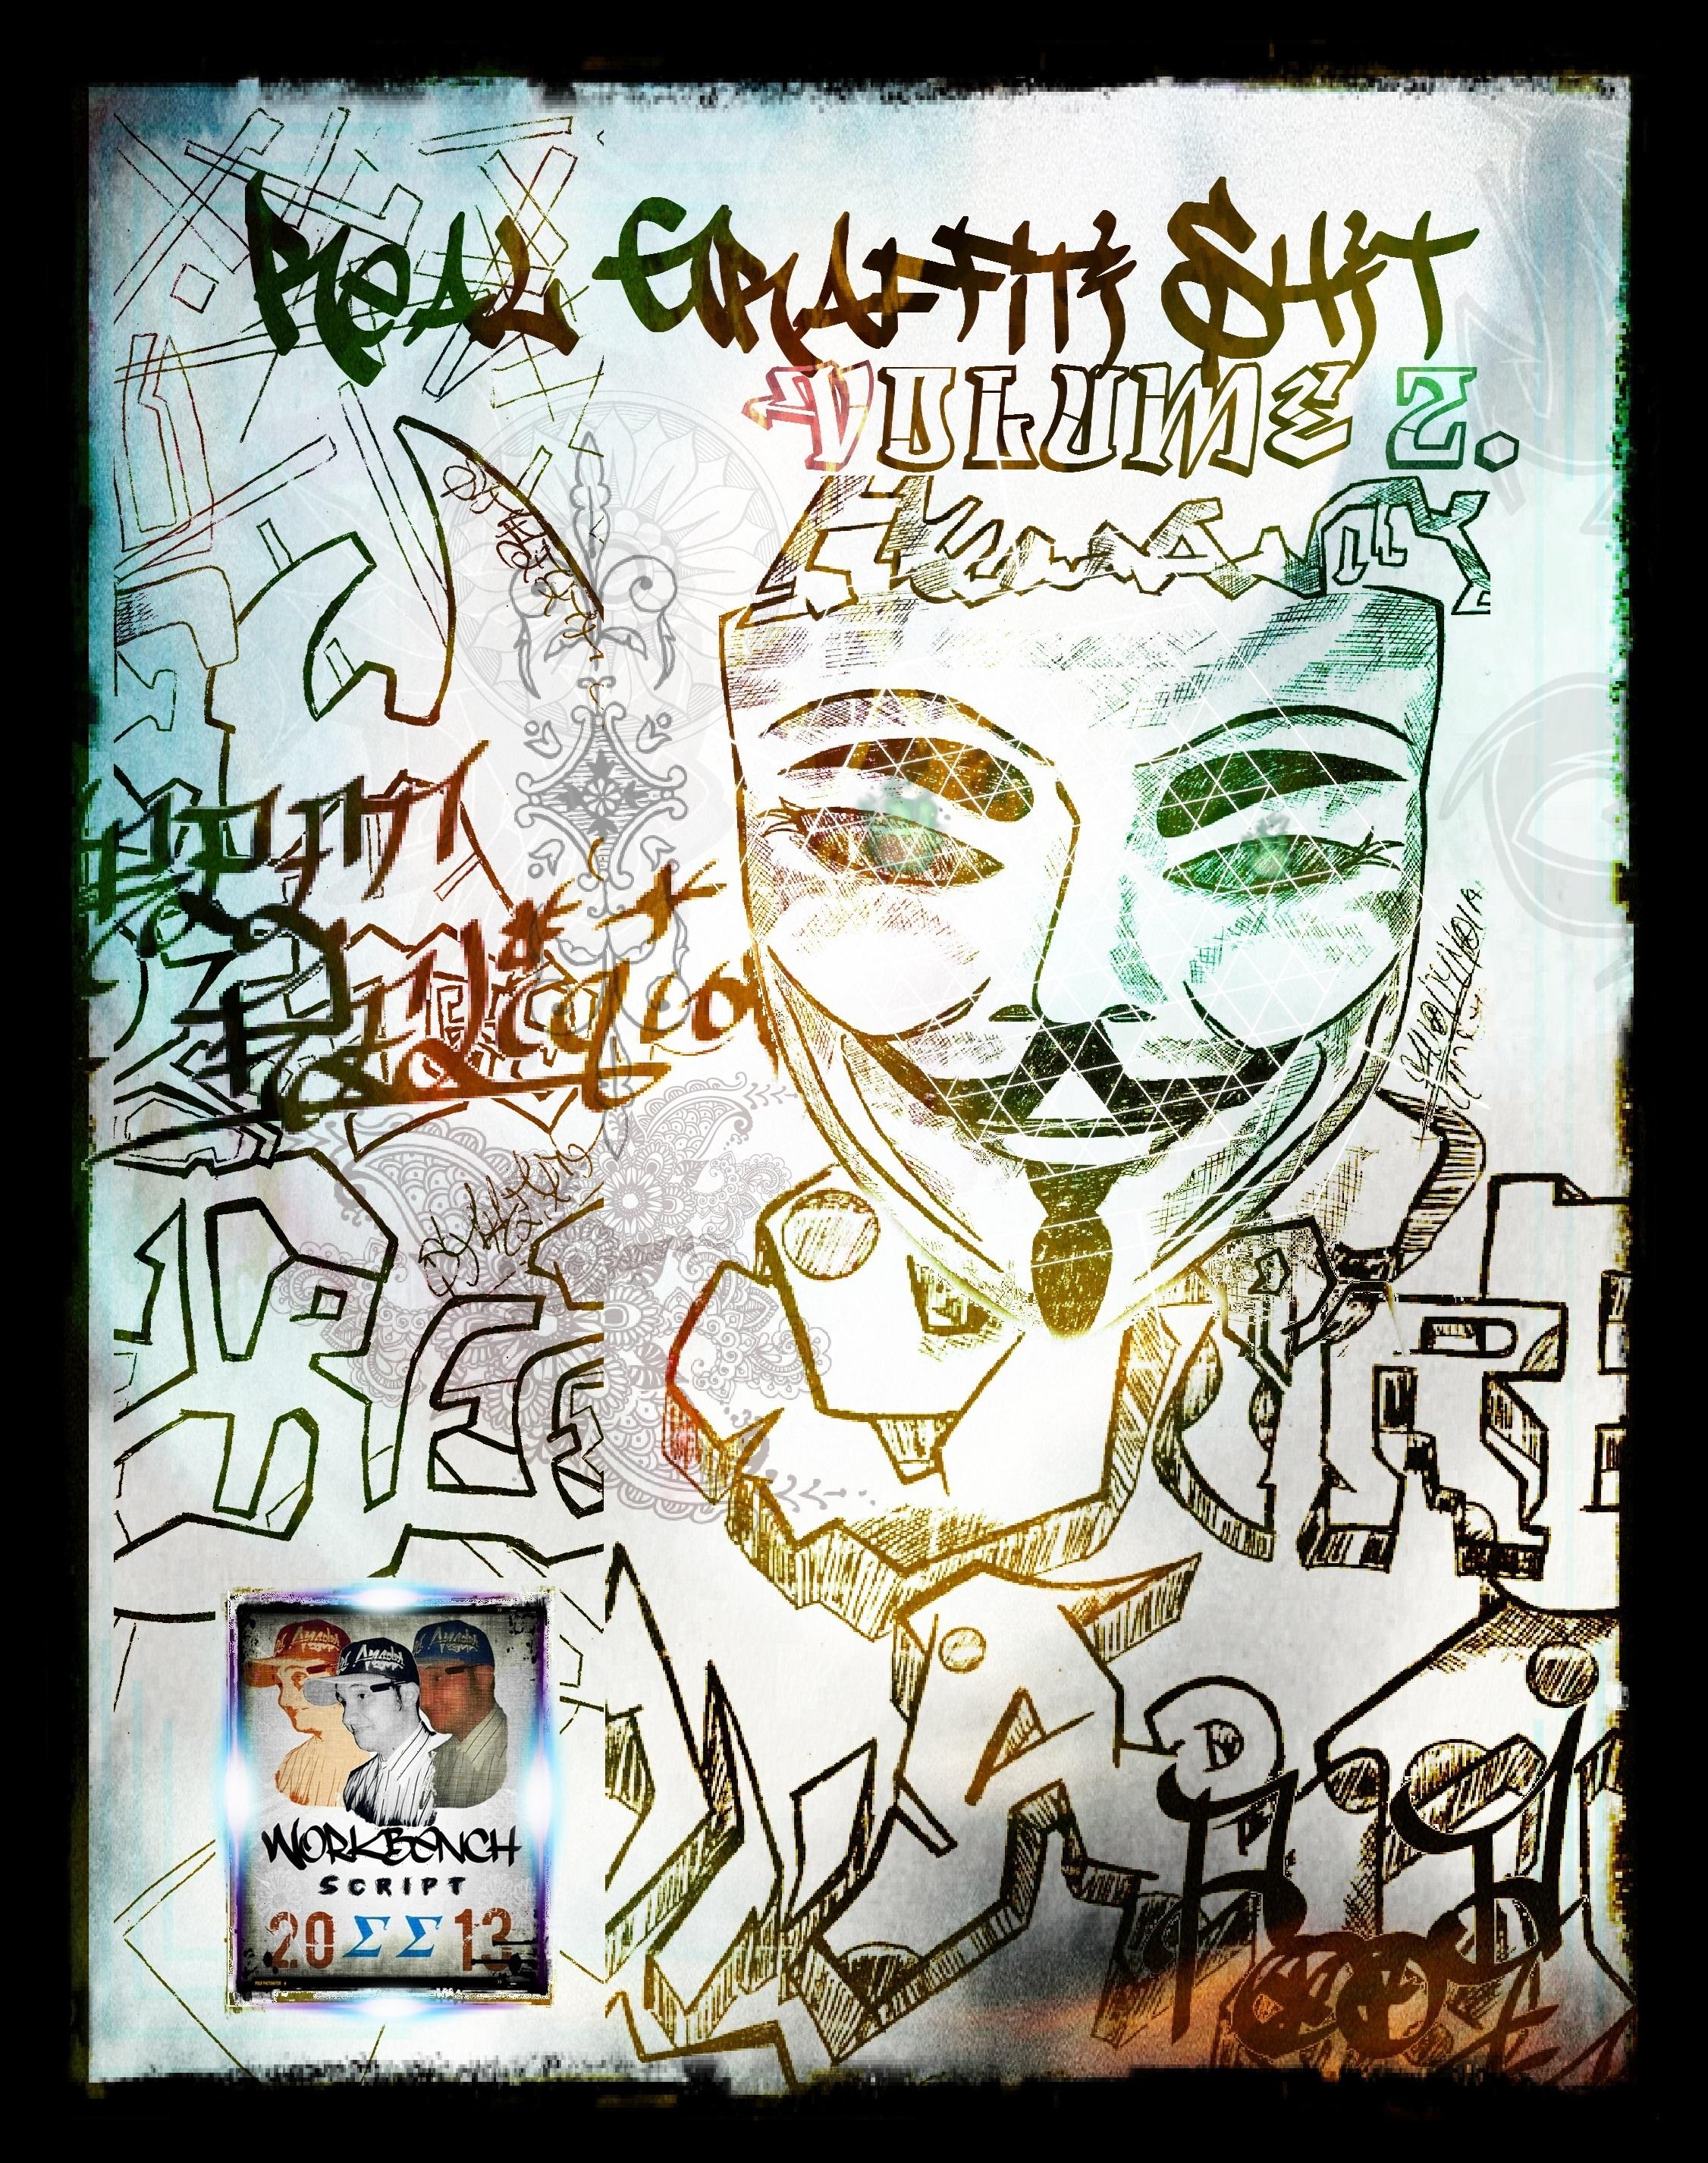 Artbook No.5: Real Graffiti Shit Volume 2